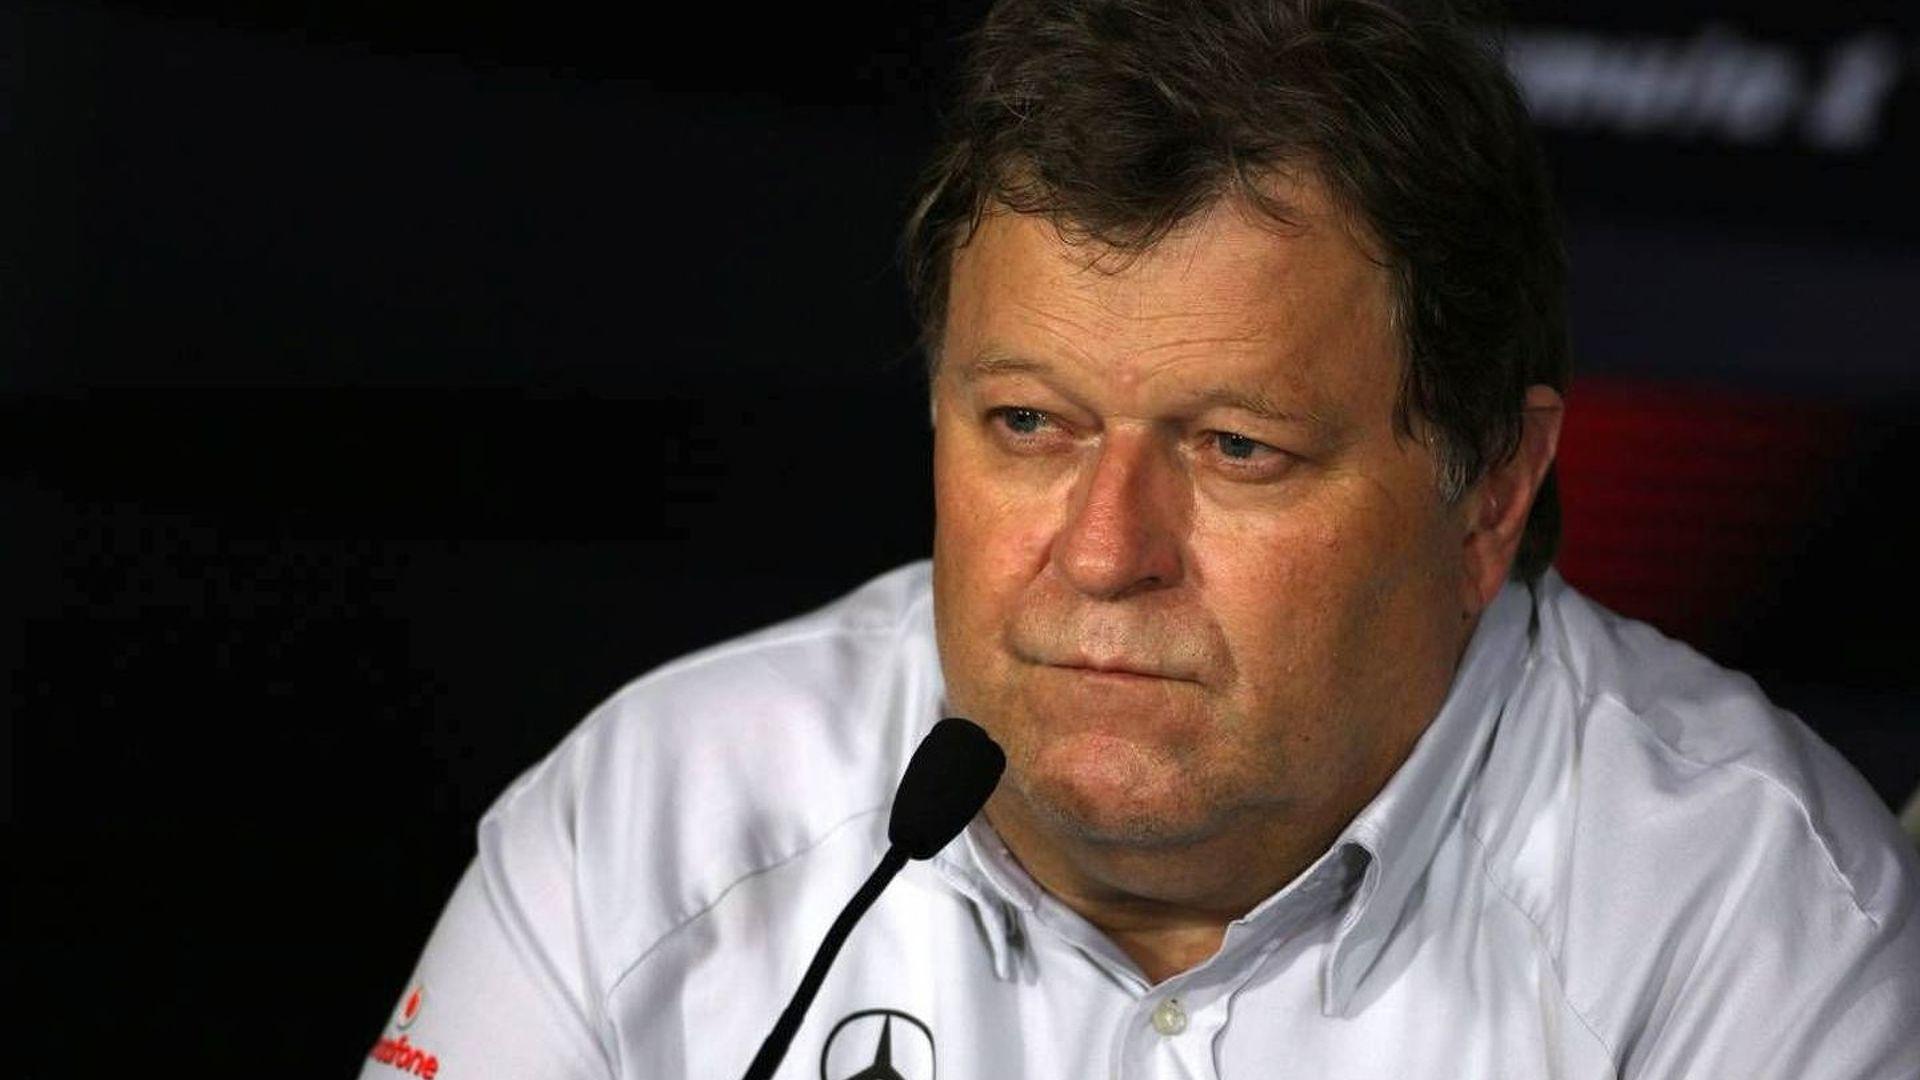 Haug hints Mercedes to sign German driver